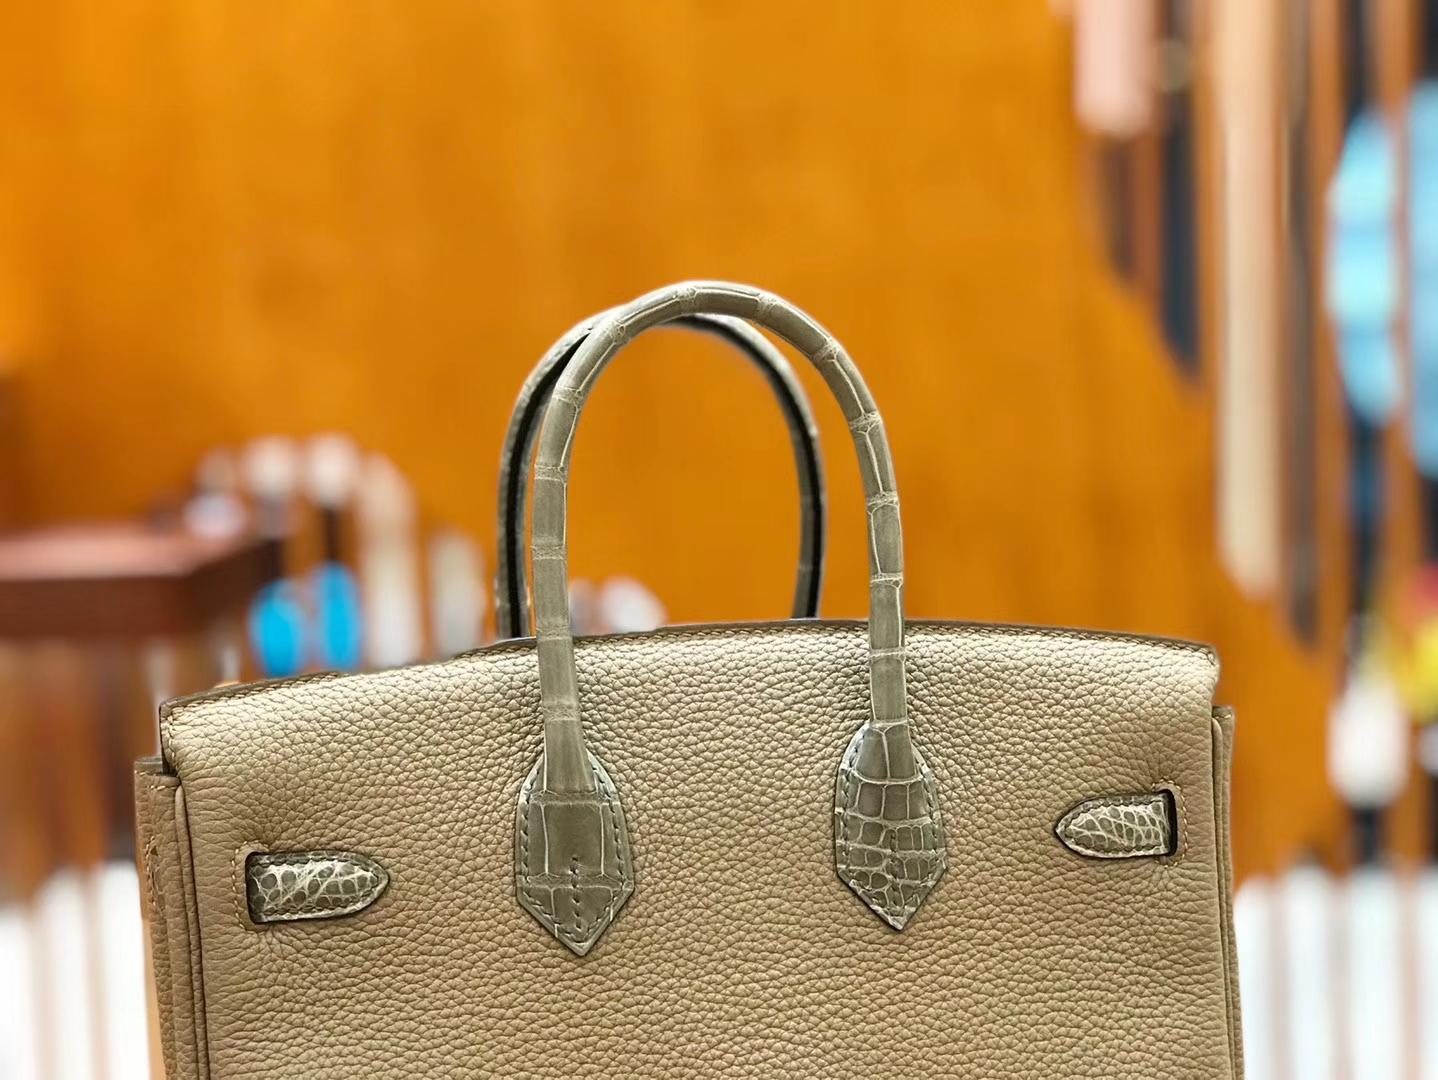 Hermès(爱马仕)Birkin 25cm Touch 斑鸠灰 鳄鱼皮拼牛皮 全手工缝制